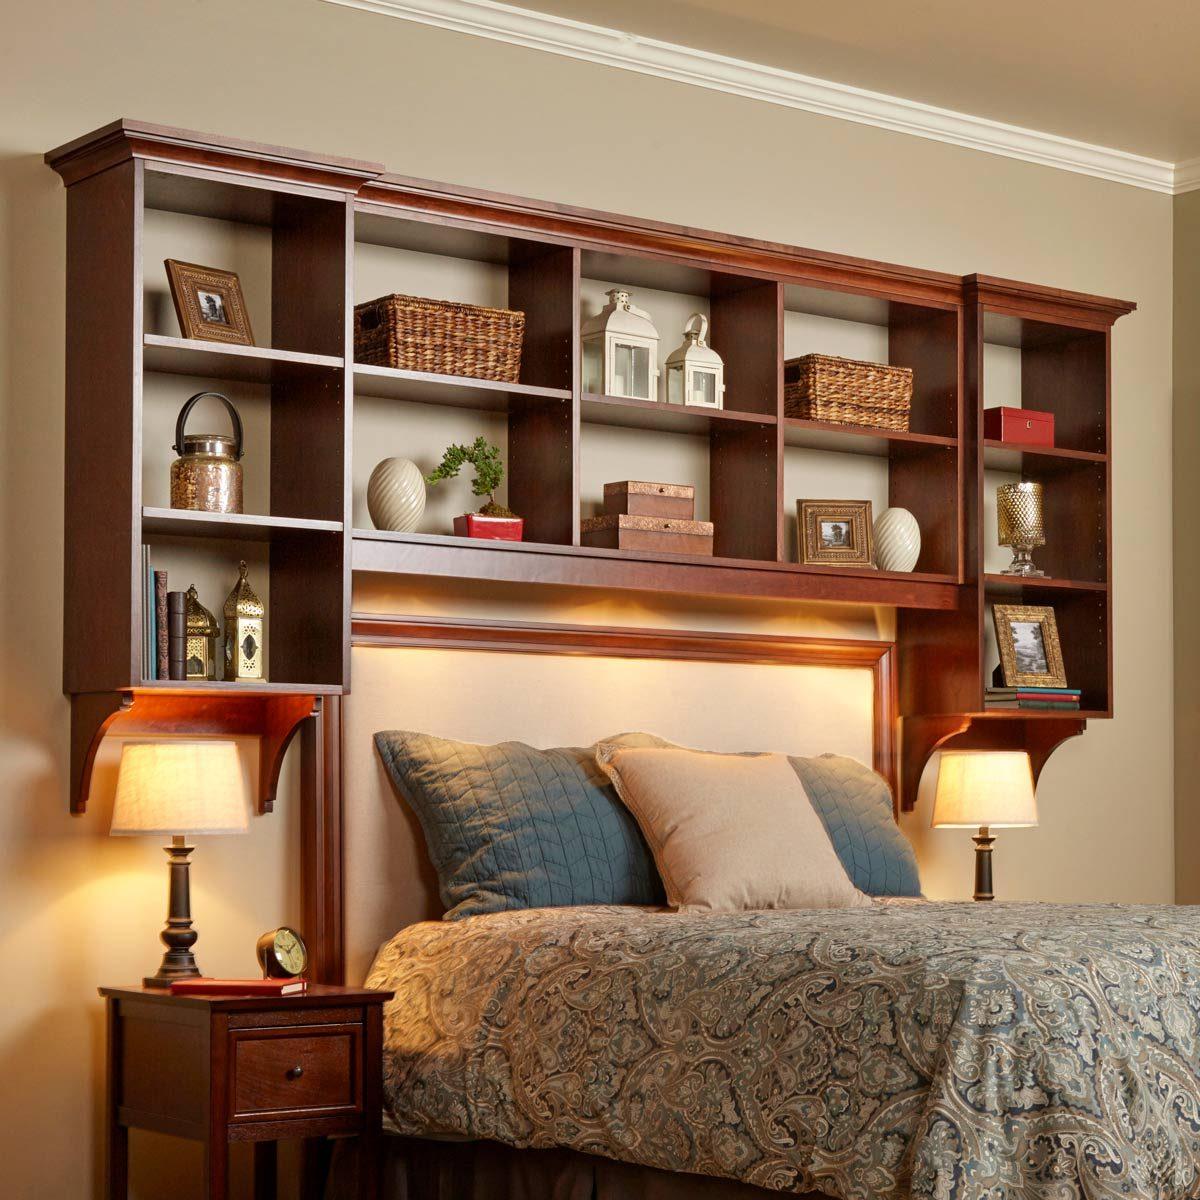 Admirable How To Hang Shelves Family Handyman Home Interior And Landscaping Spoatsignezvosmurscom